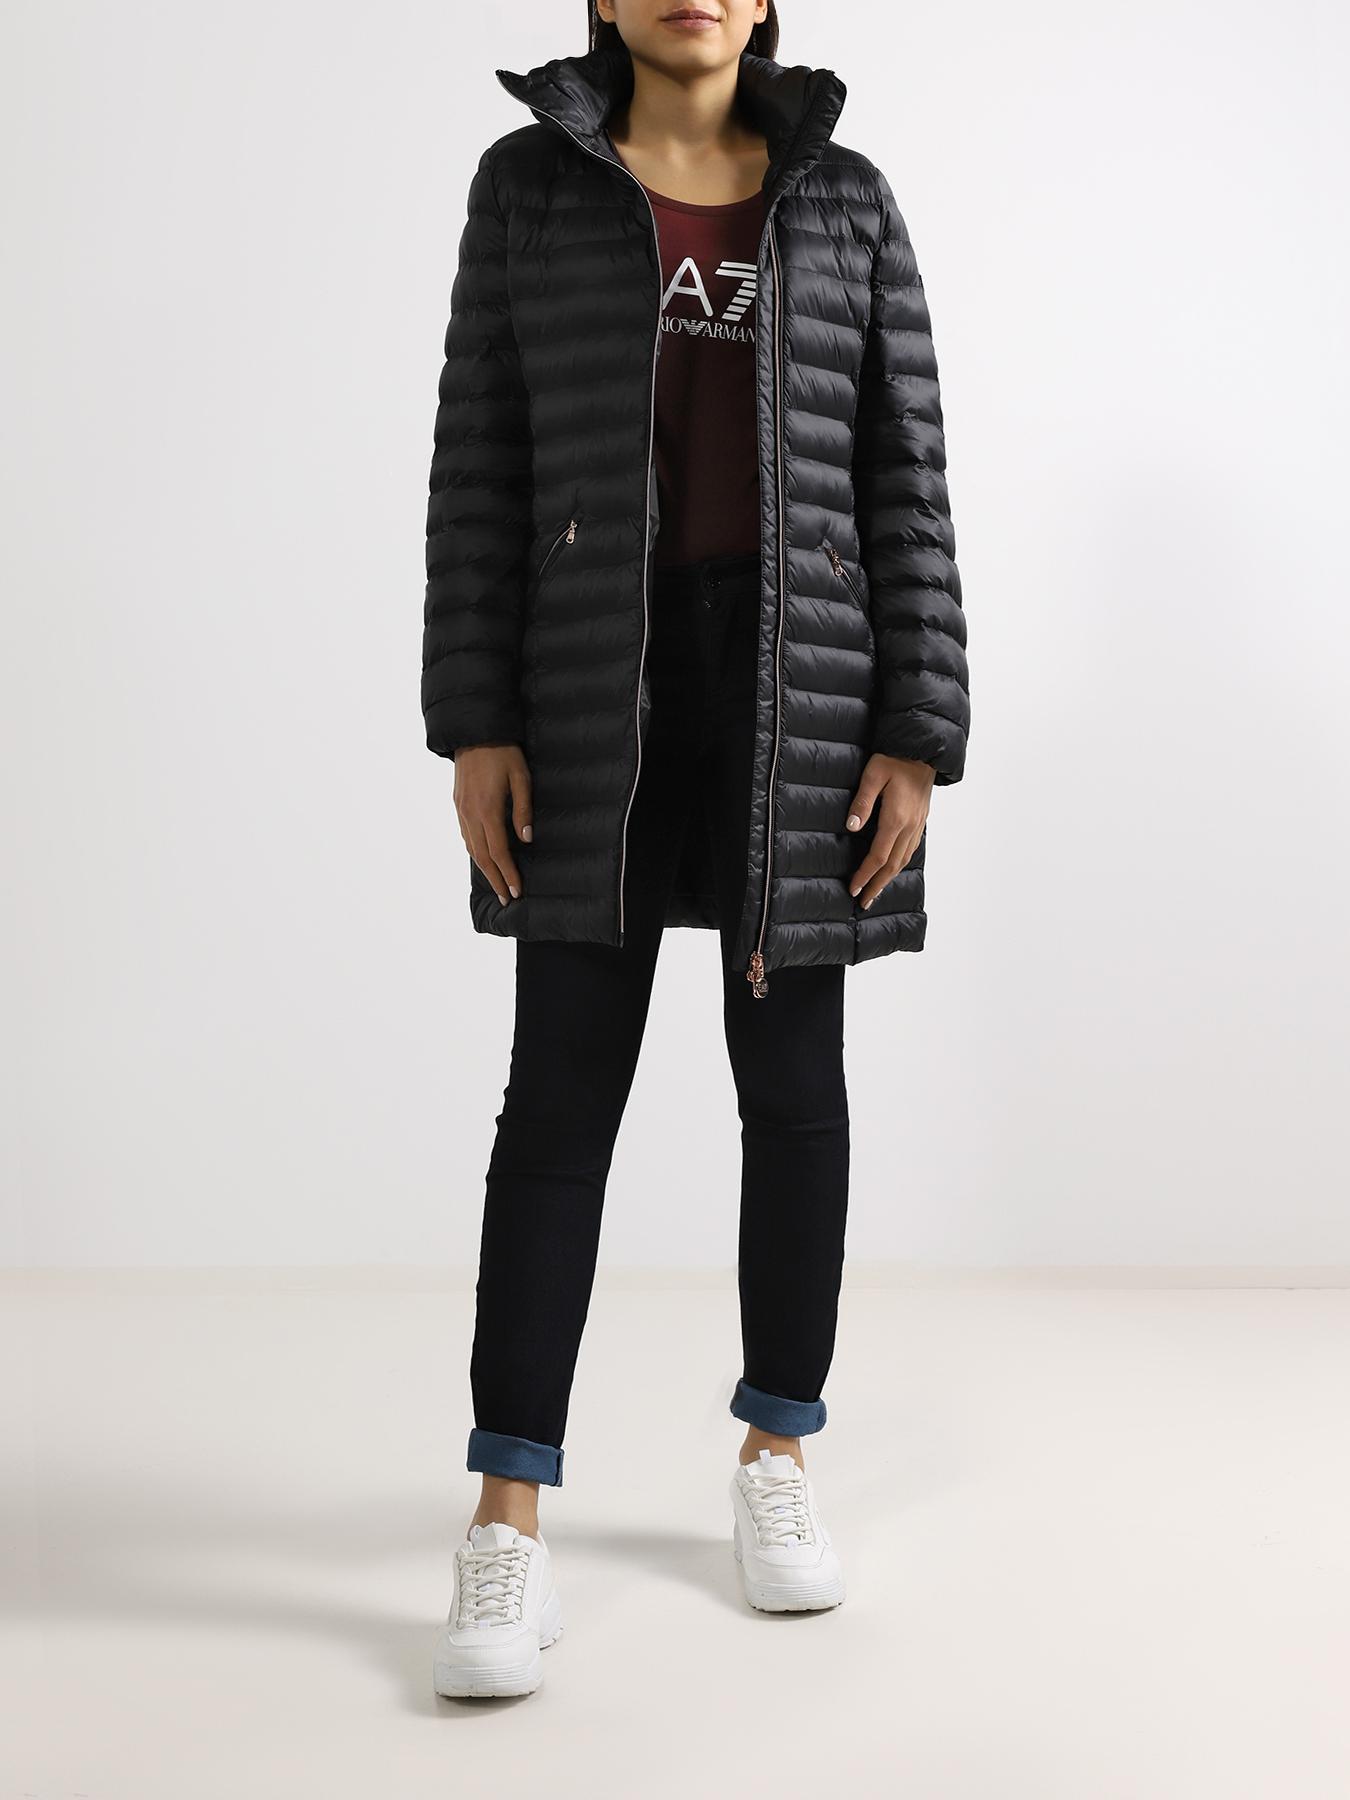 EA7 Emporio Armani Удлиненная куртка 352512-041